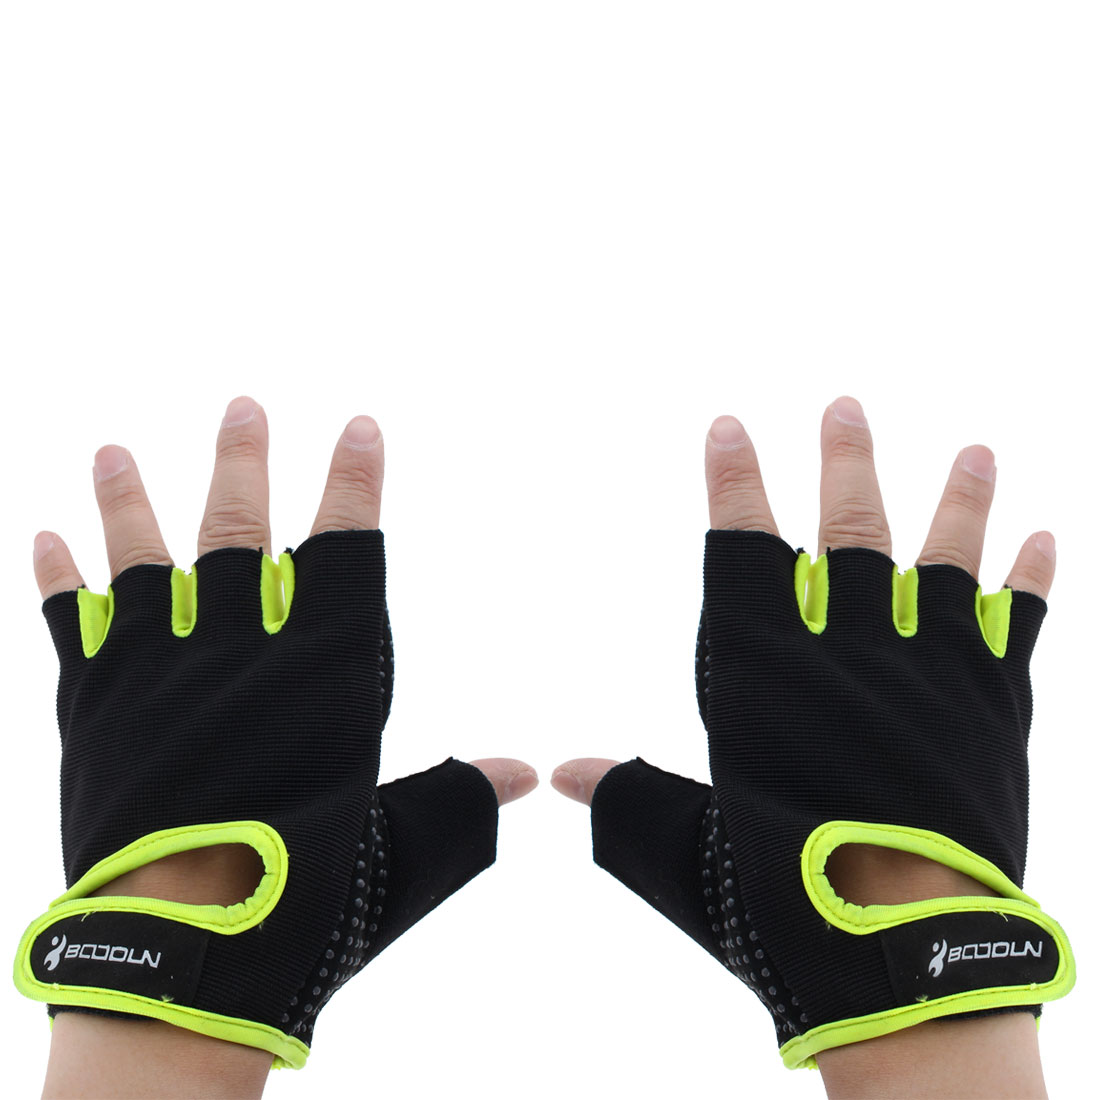 BOODUN Authorized Exercise Weight Biking Lifting Training Microfiber Non-slip Fitness Half Finger Gloves Fluorescent Green XL